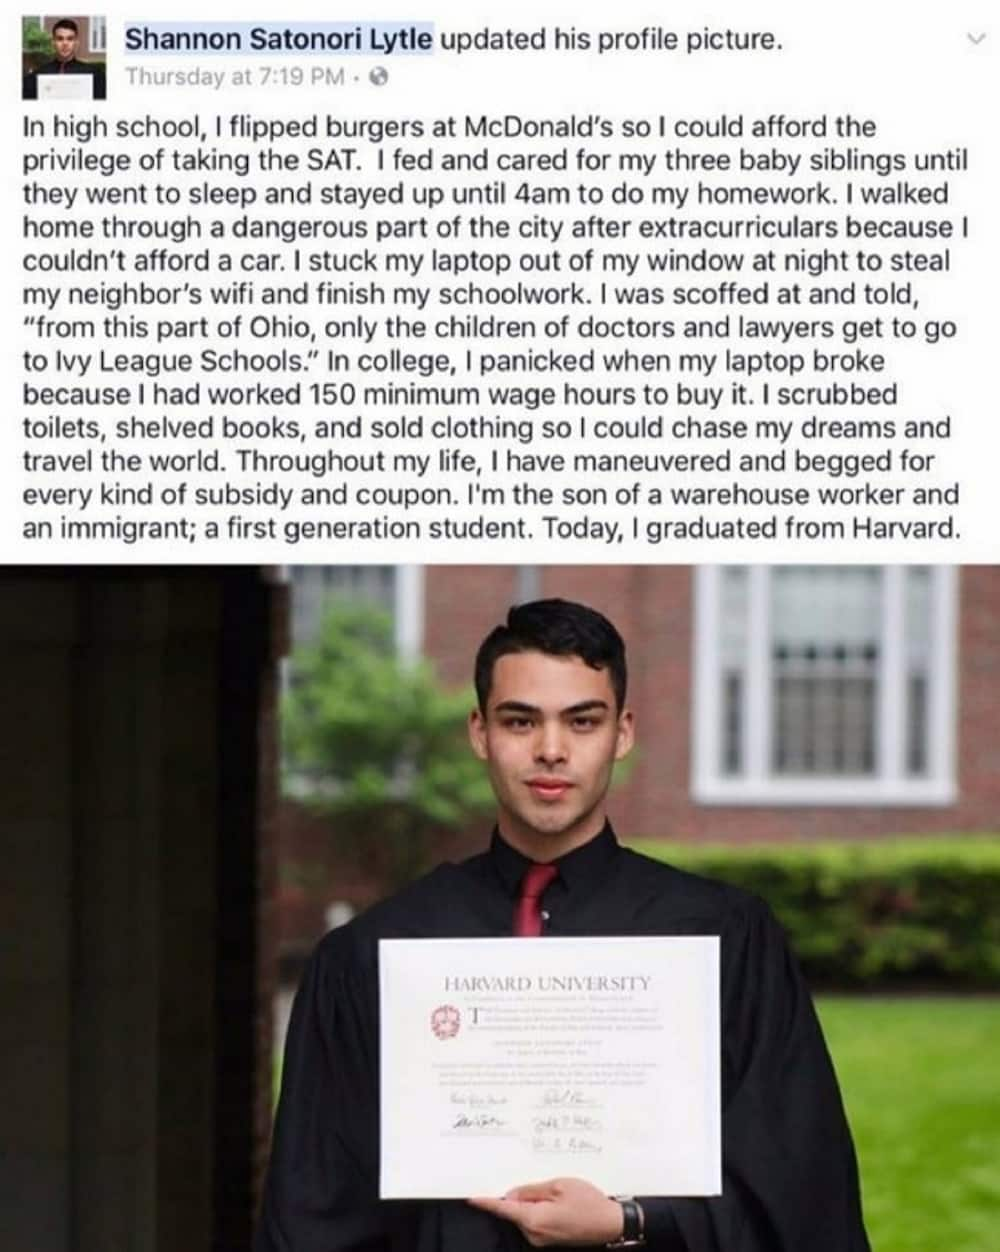 Man went from making burgers at McDonald's to graduating from Harvard